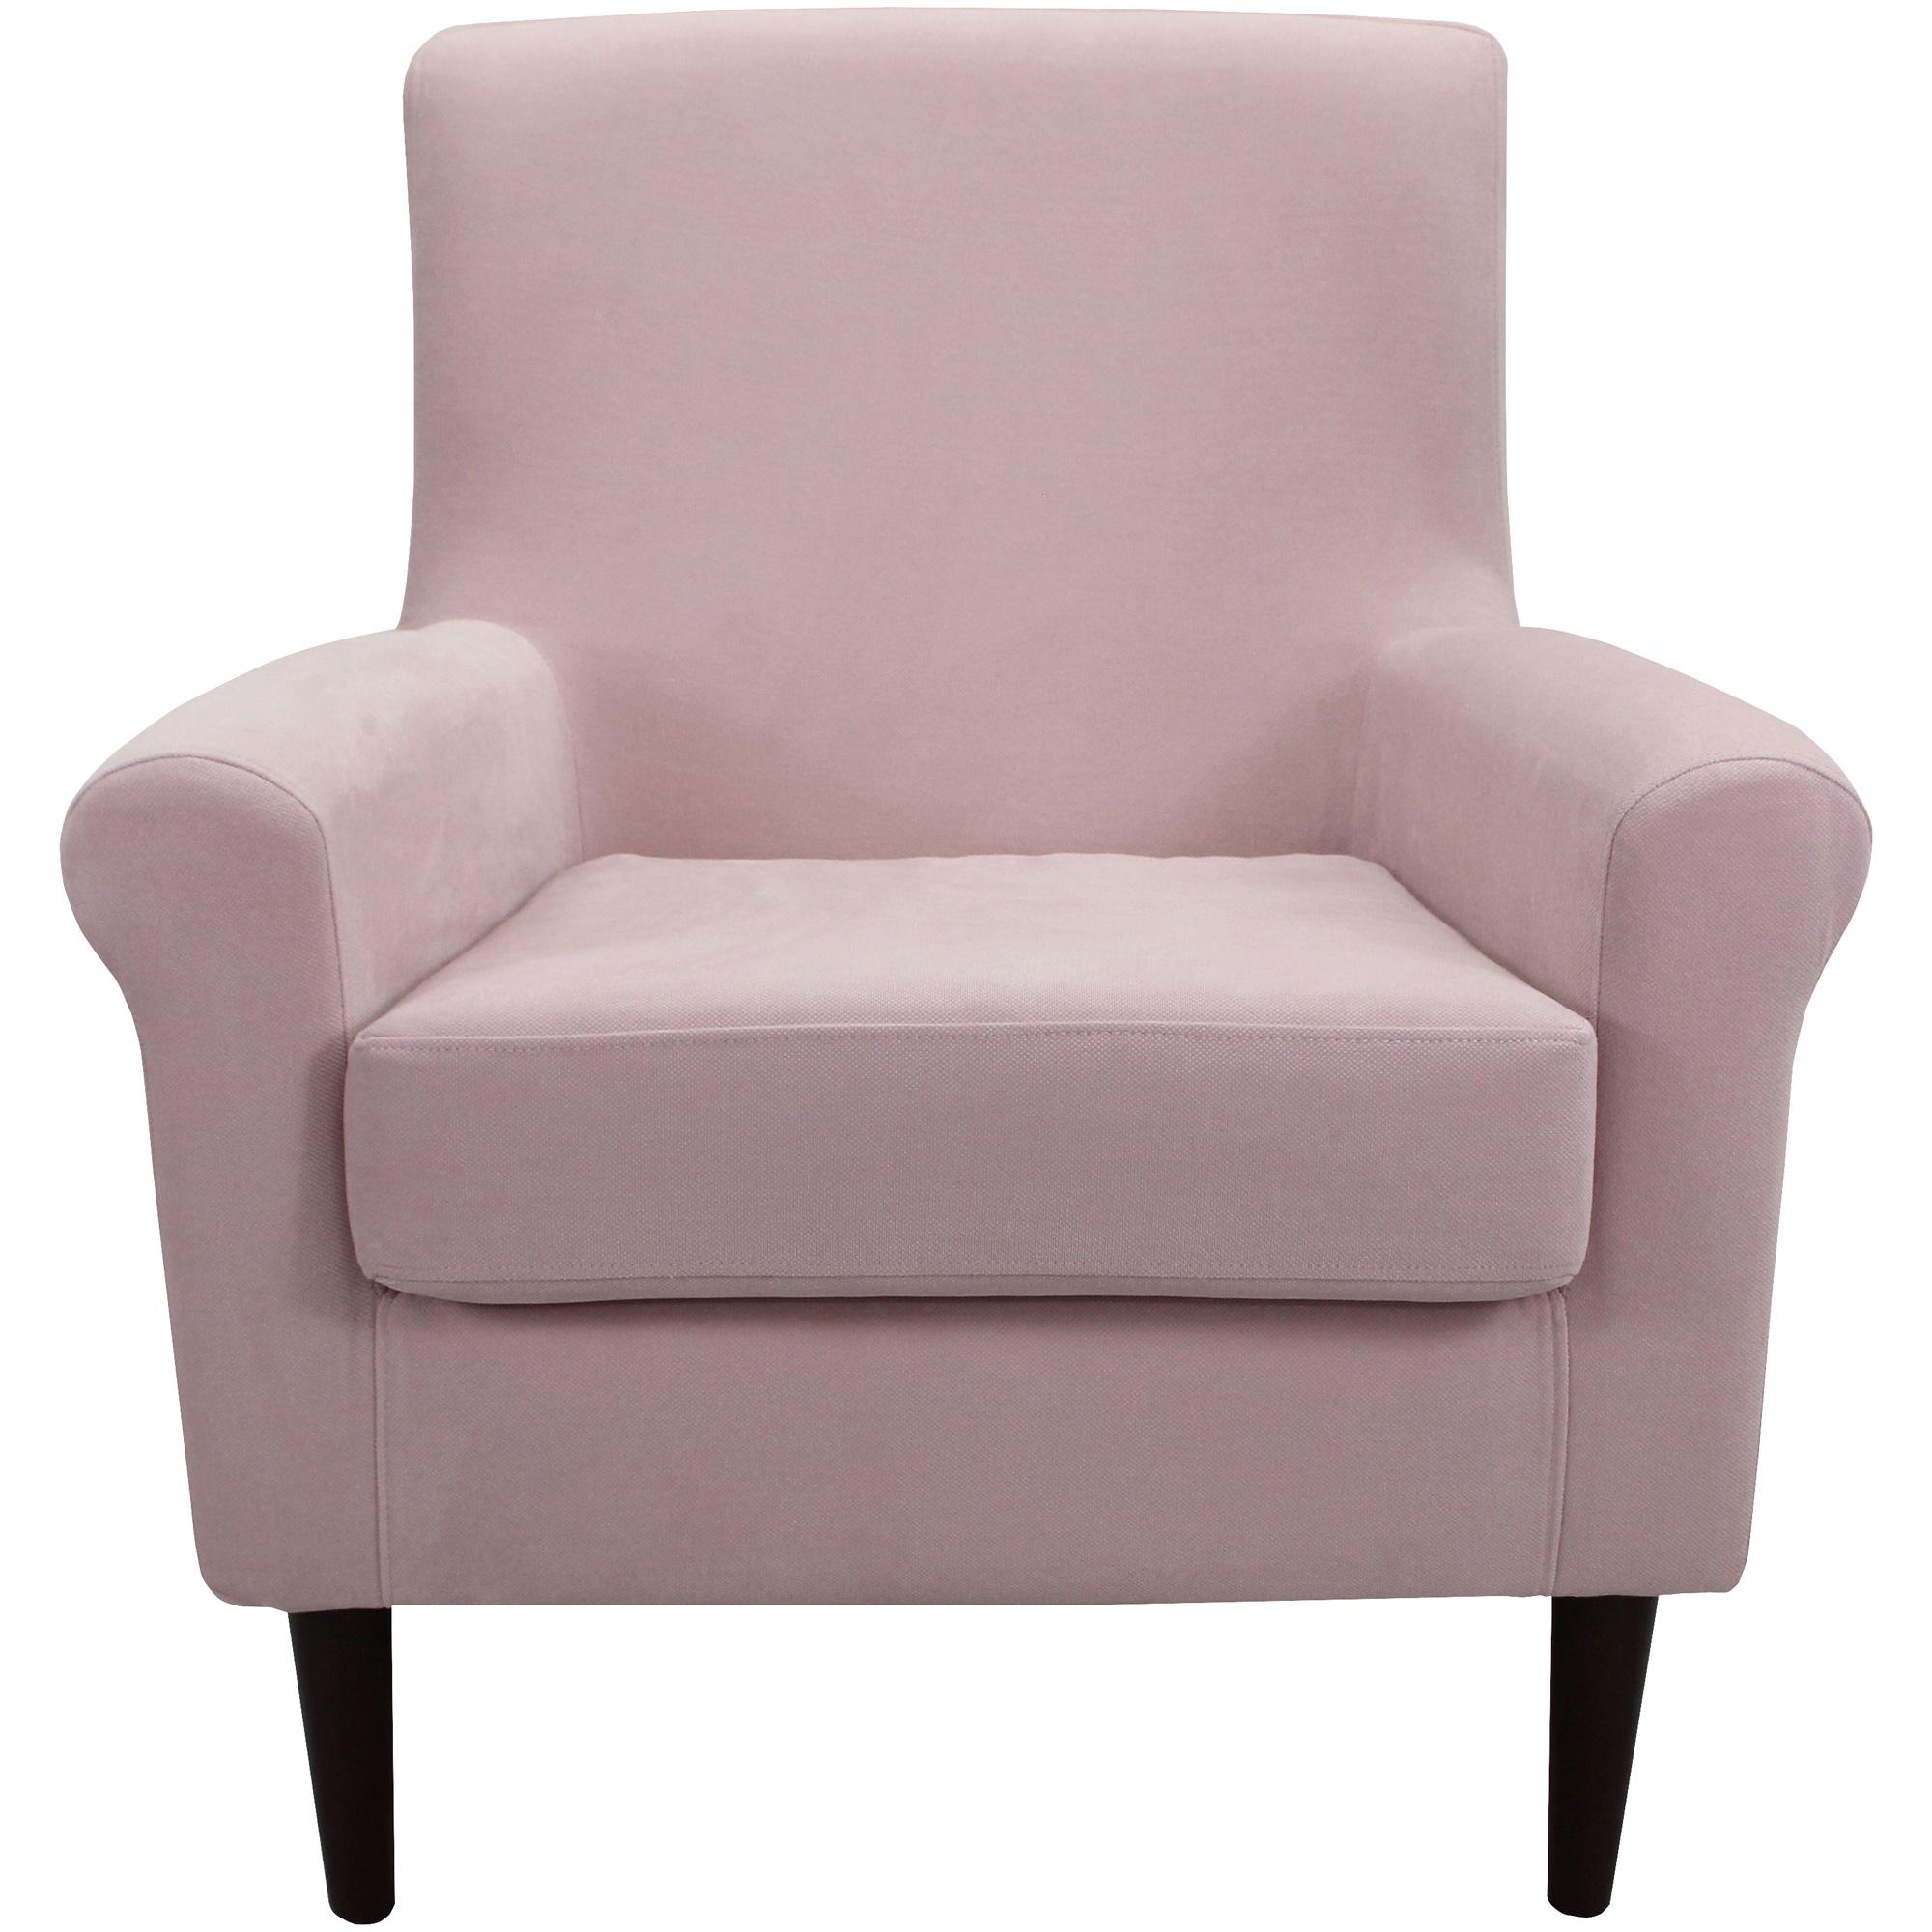 Overman | Ellis Blush Accent Chair